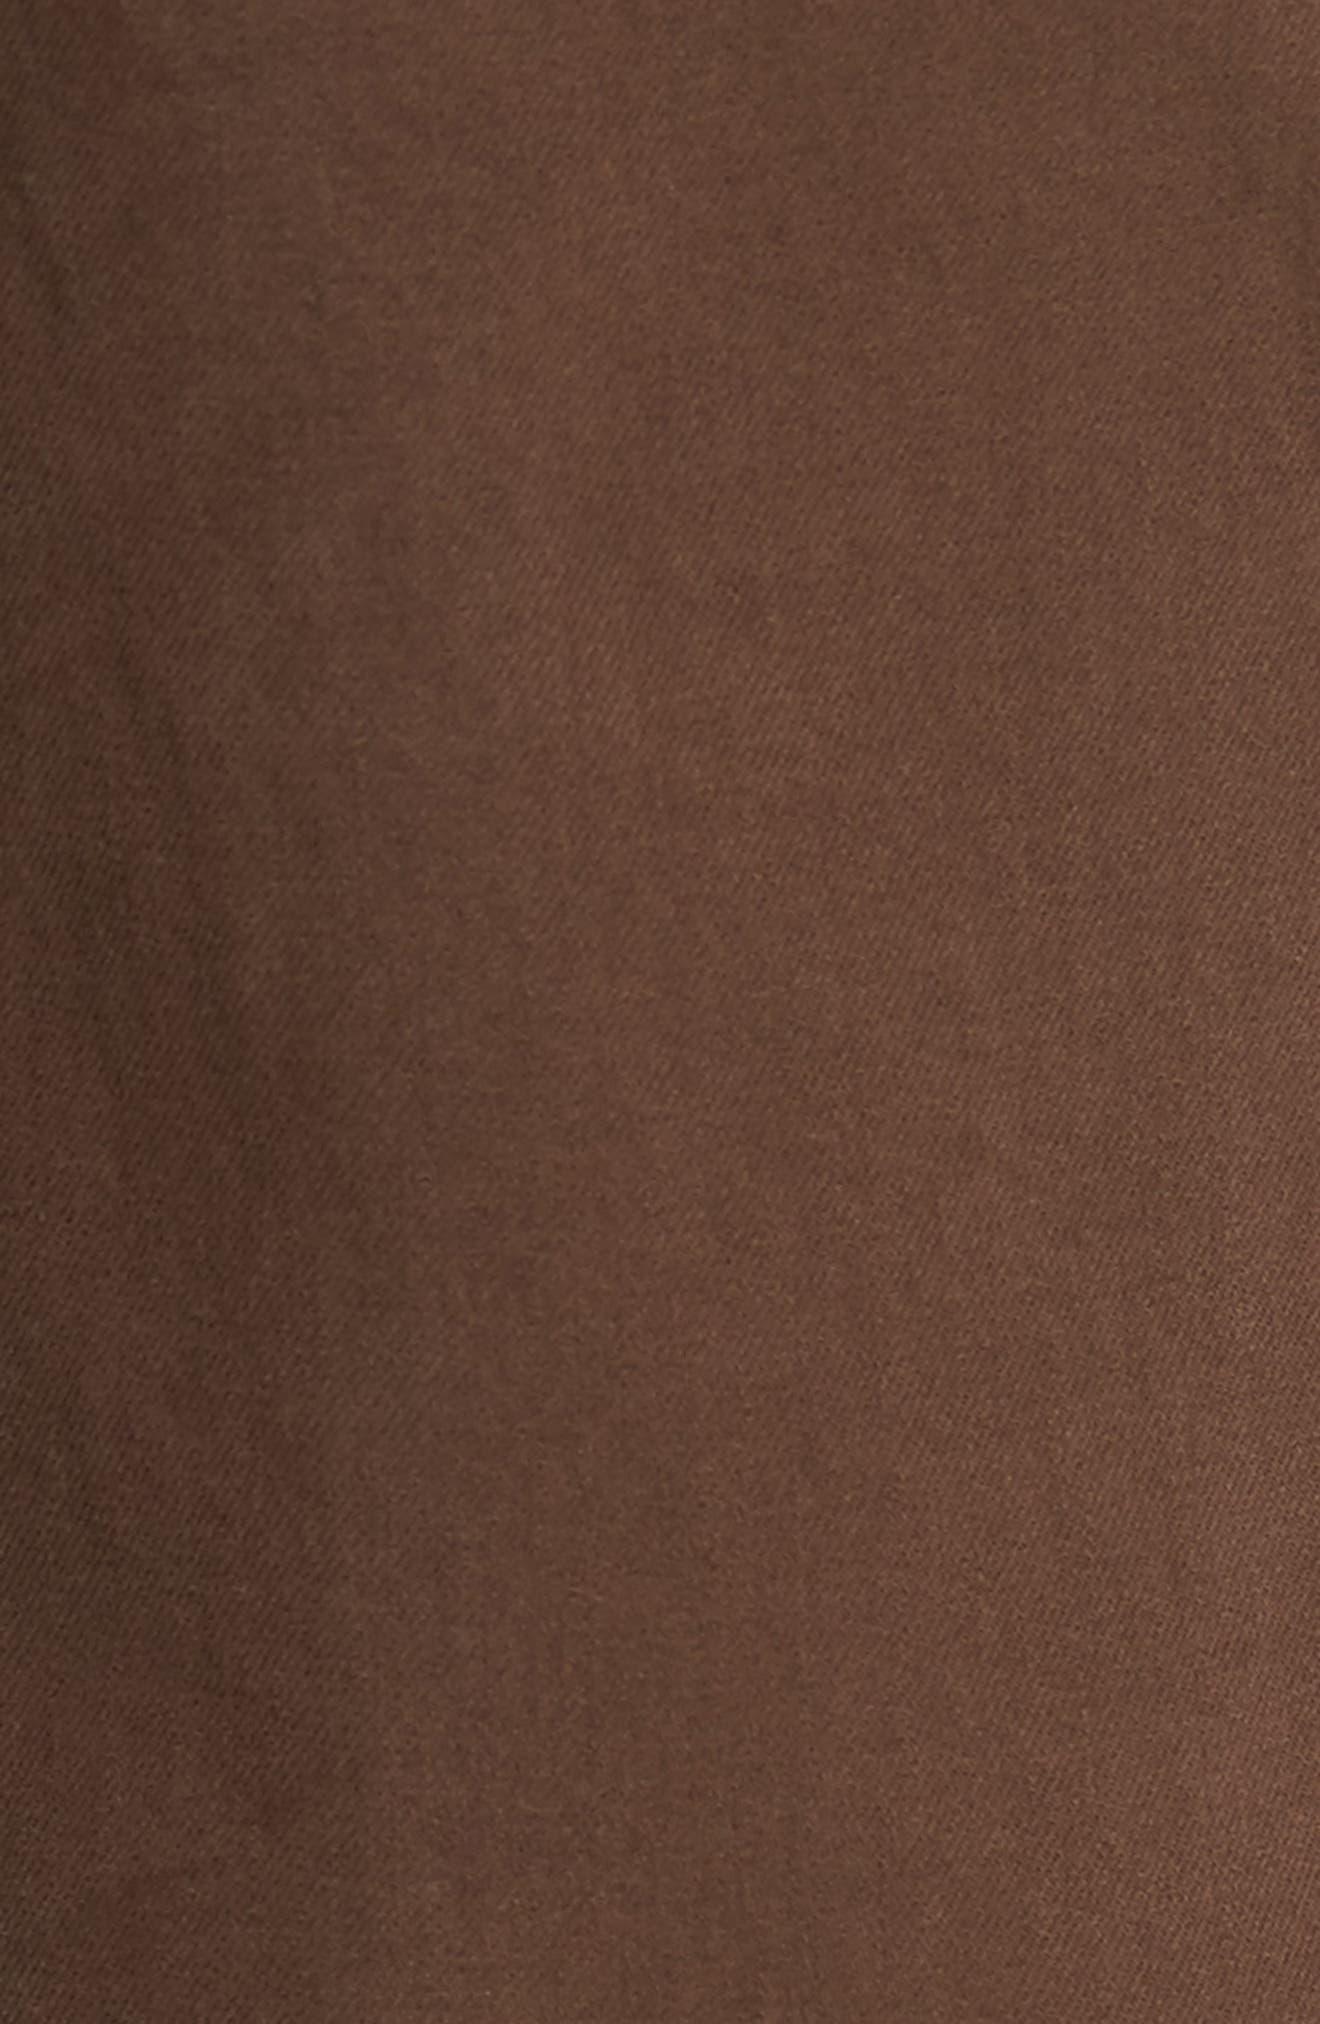 Brixton Slim Straight Fit Jeans,                             Alternate thumbnail 5, color,                             202